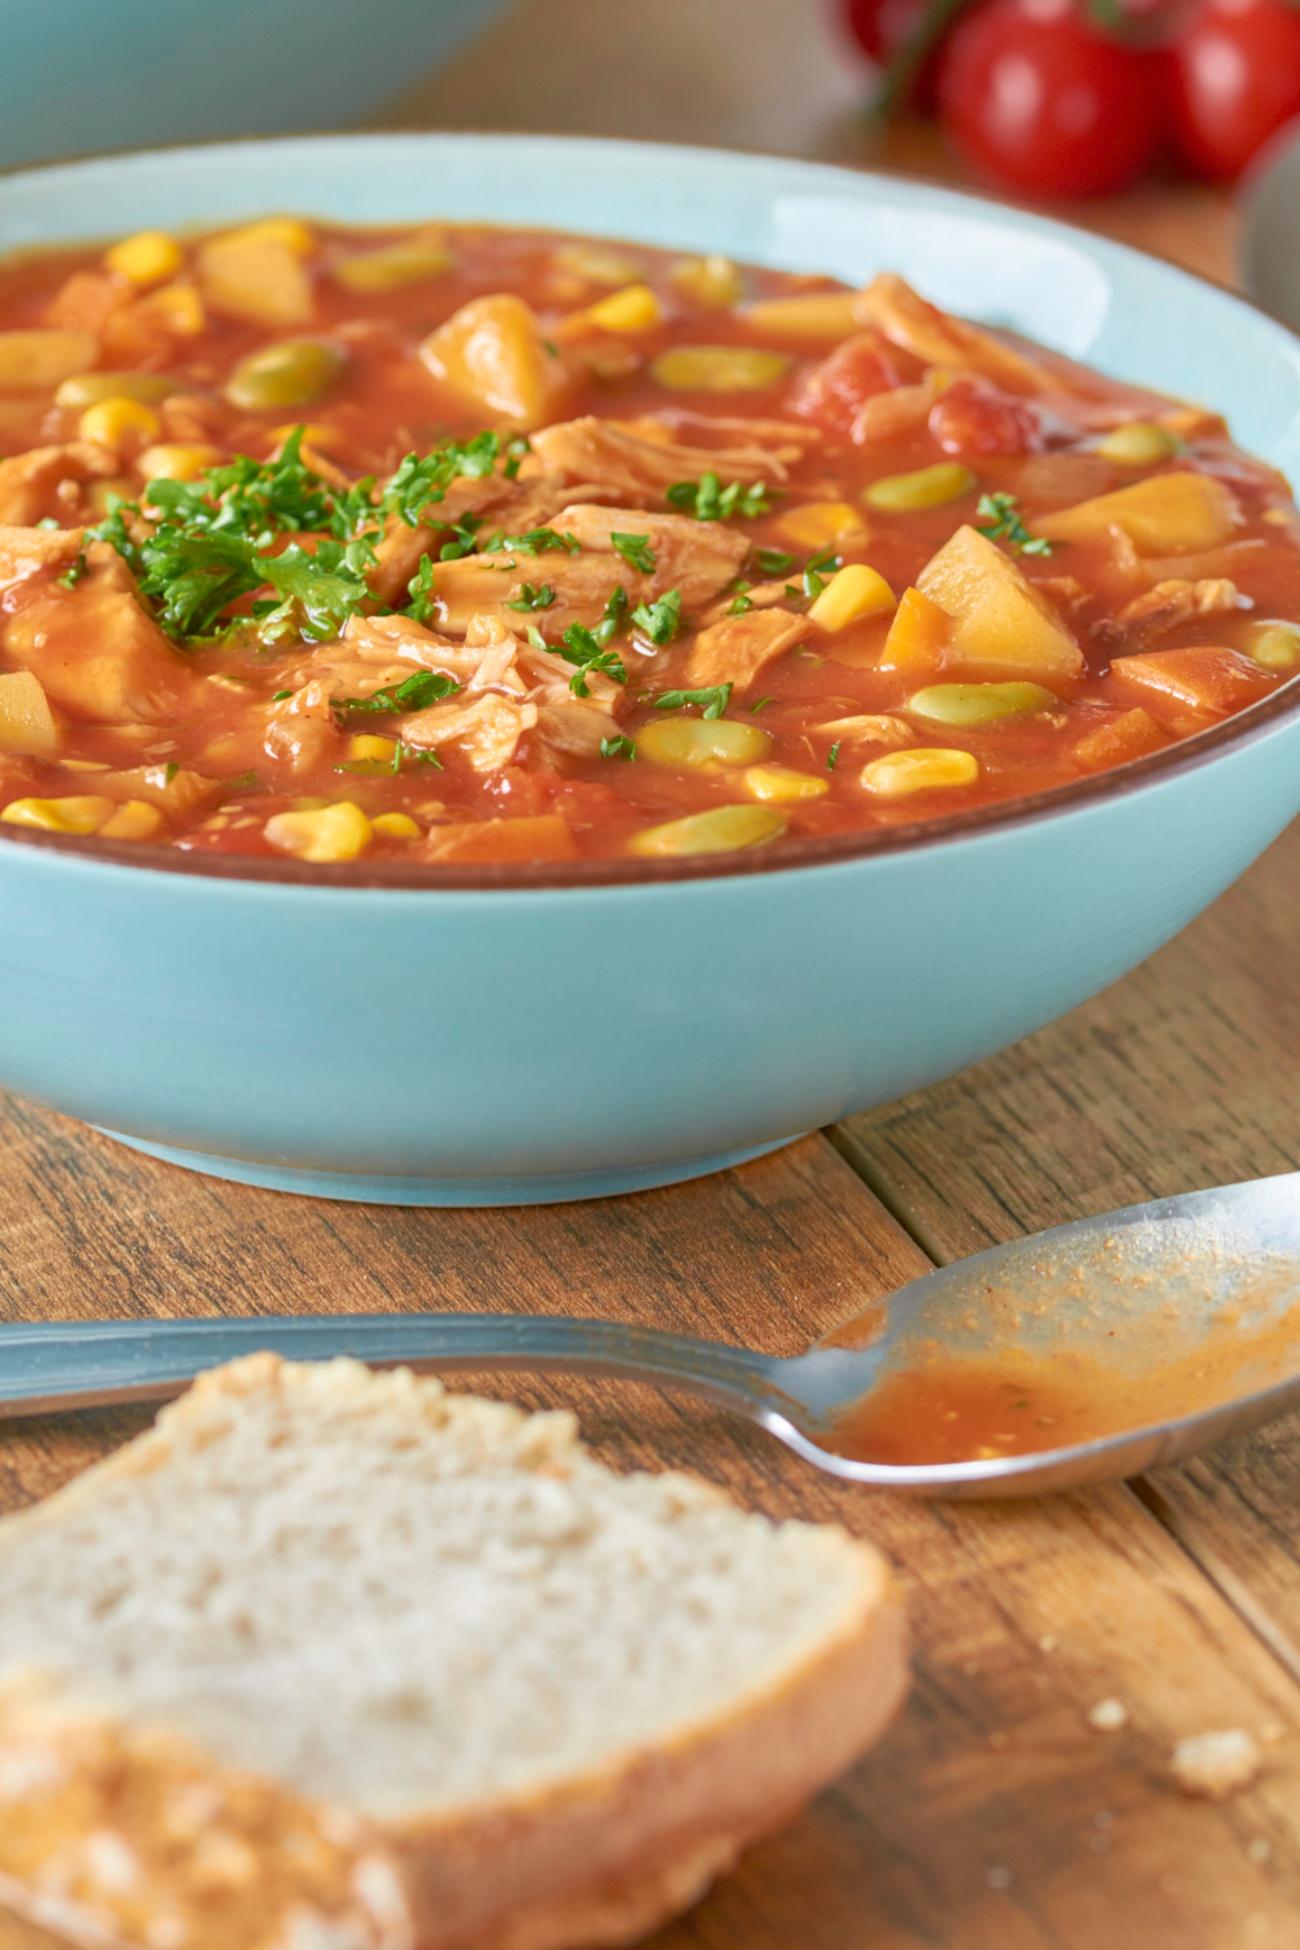 Homemade chicken Brunswick stew